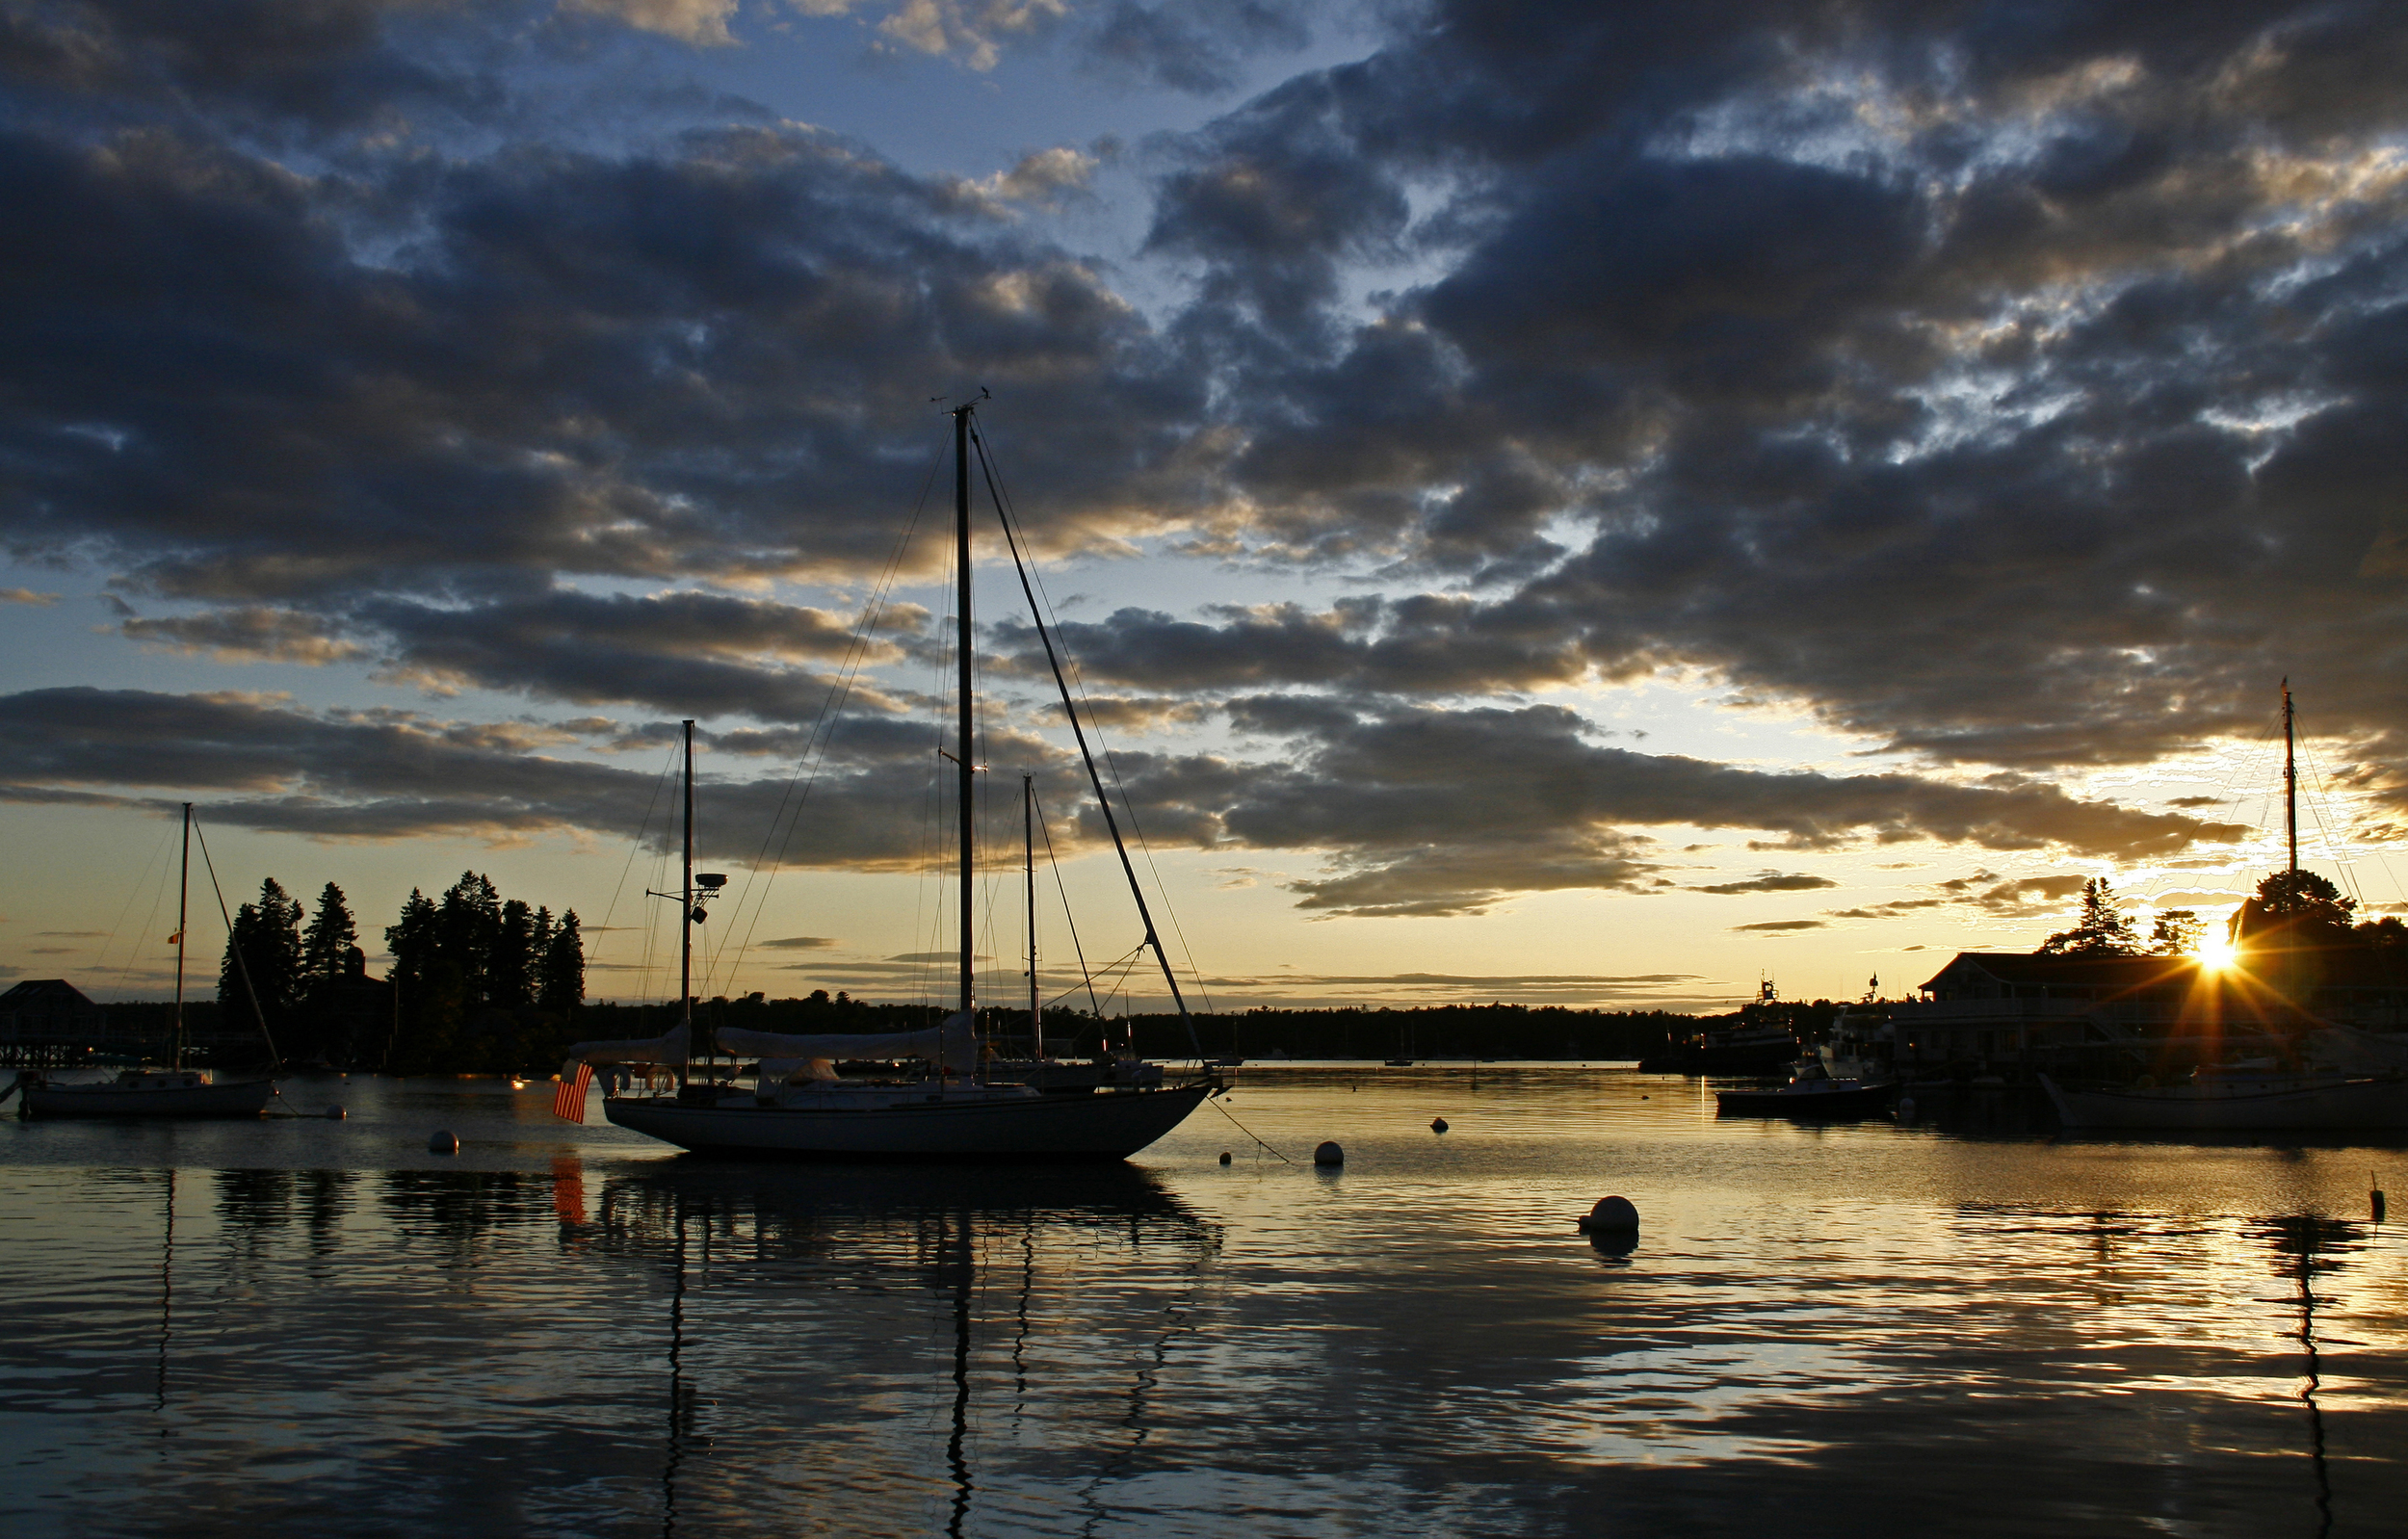 Sunset Boothbay Harbor